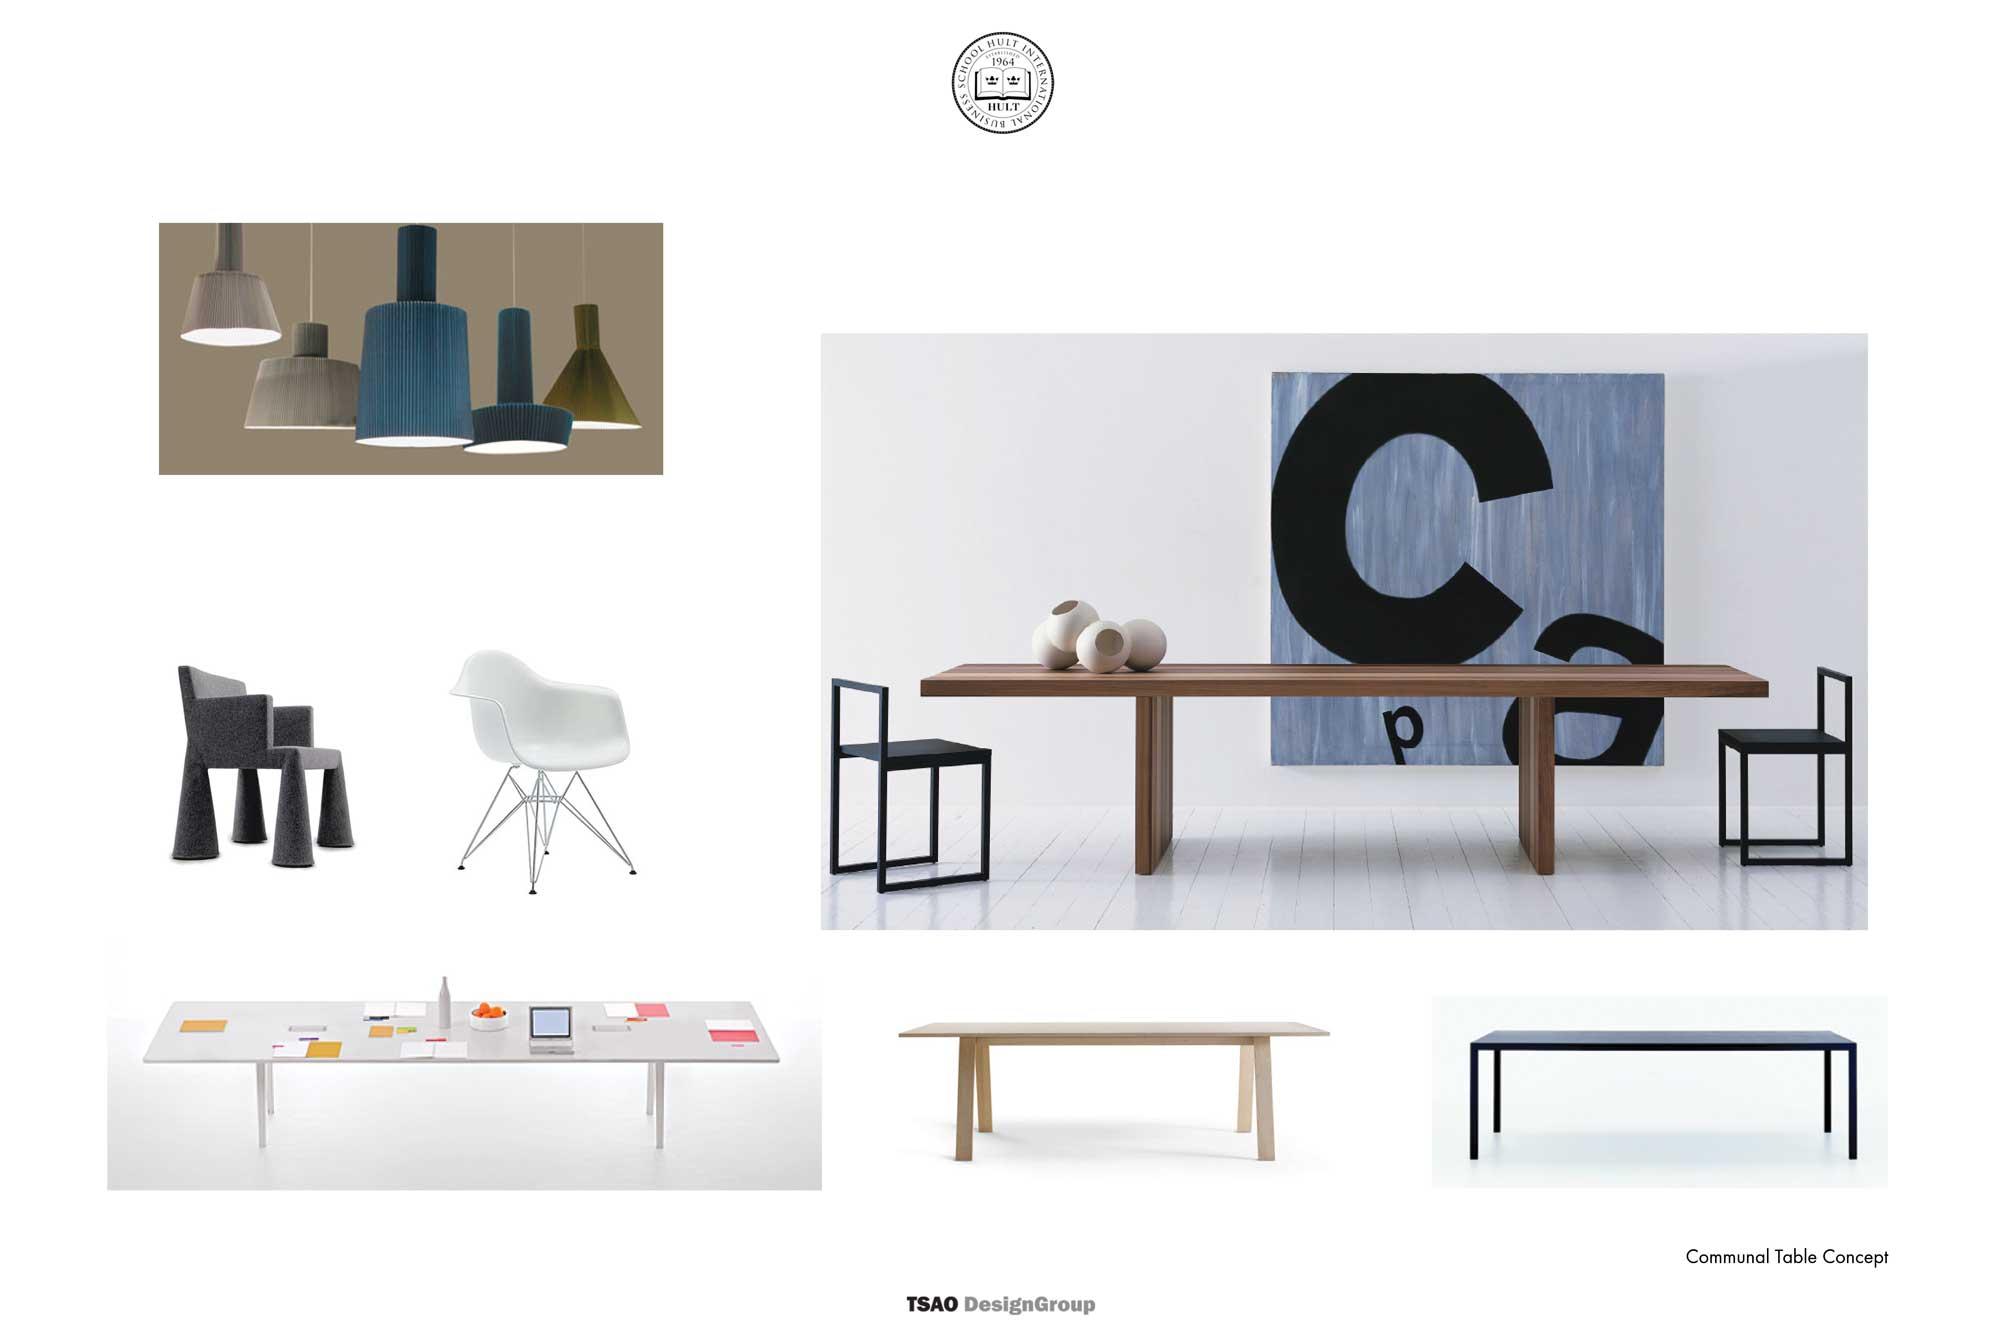 tsao-hult1355-concept-communal_table-01.jpg